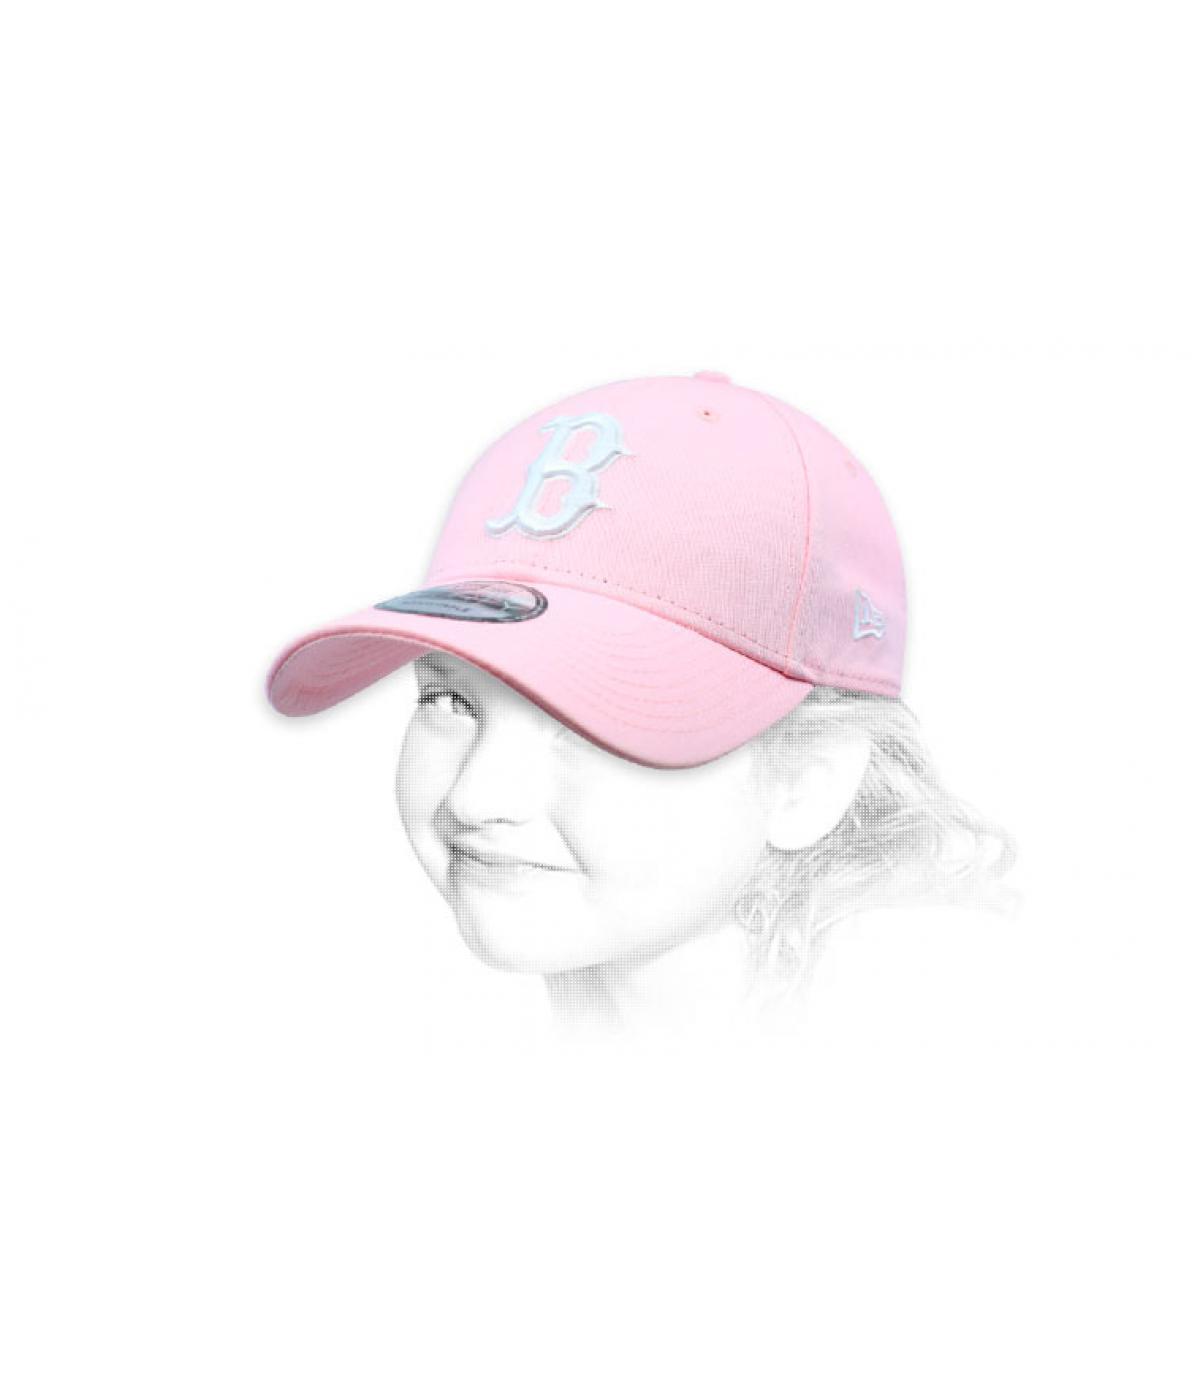 casquette B enfant rose